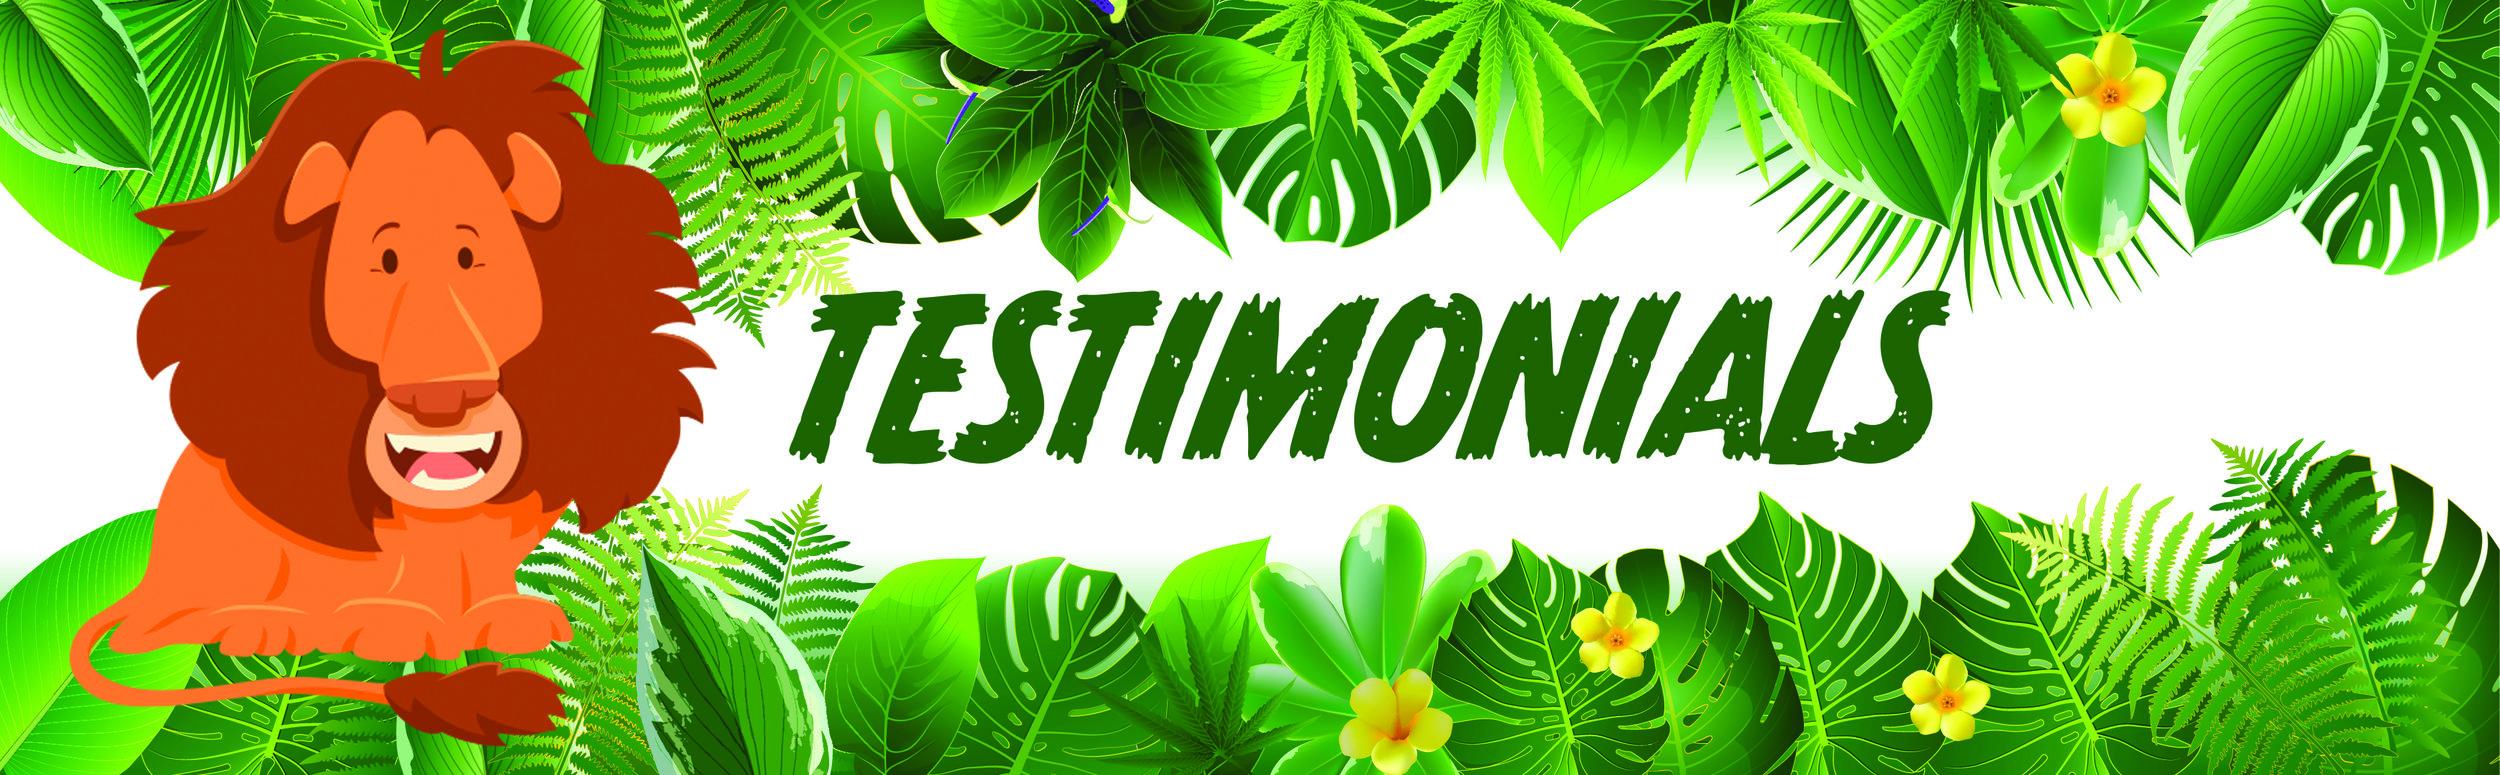 testimonials-1.jpg